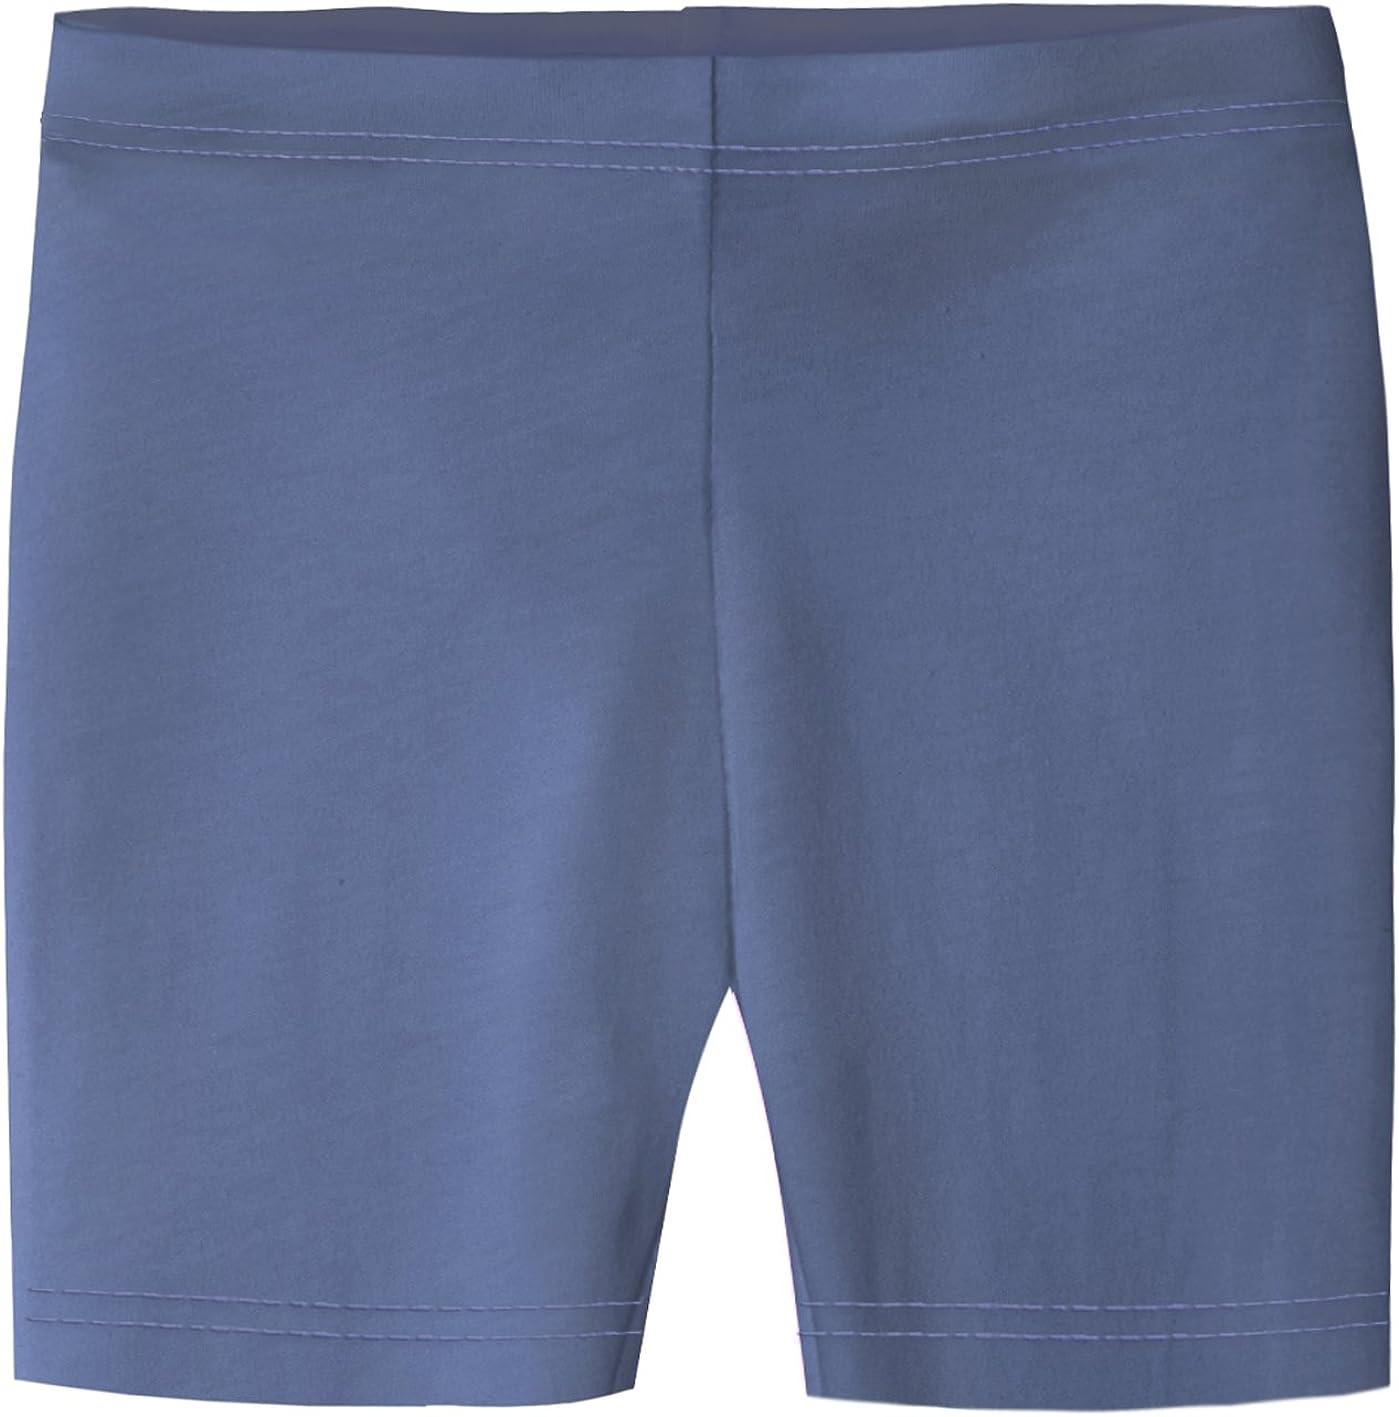 City Threads Big Girls Underwear Bike Shorts in All Cotton Perfect for SPD and Sensitive Skin Sports Dance School Uniform Denim Blue 16